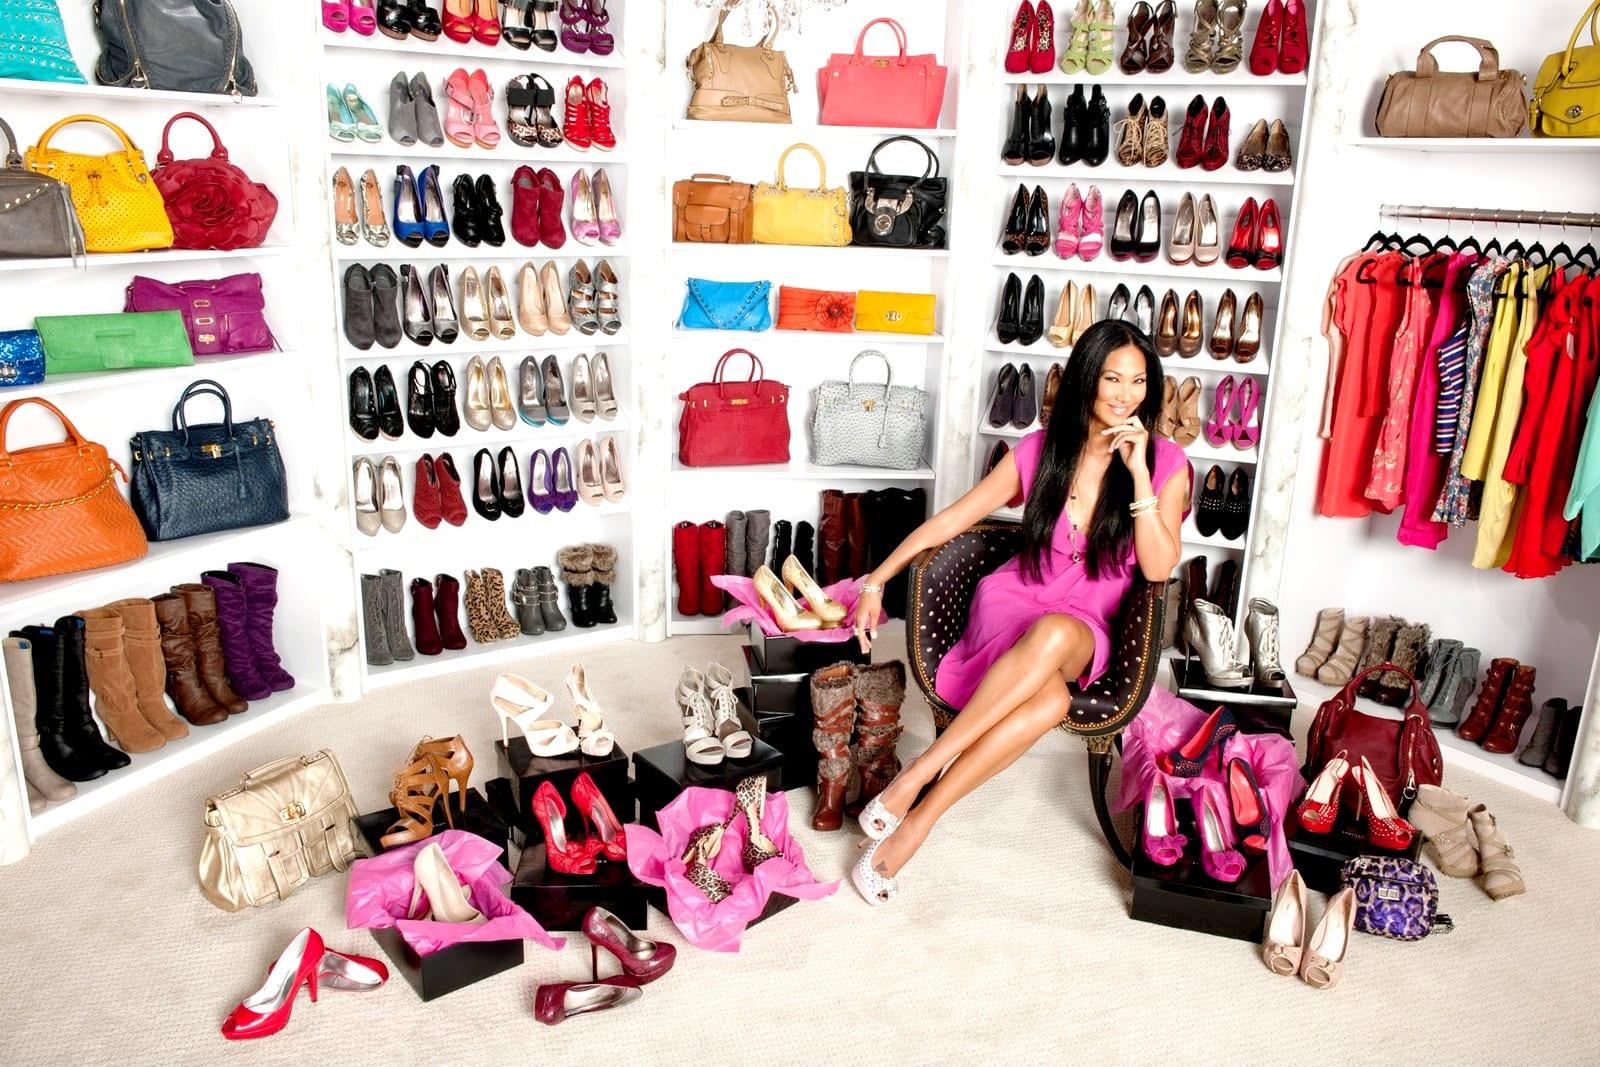 shoe-closet-1600x1067-design-time-amp-scene-celebrity-shoe-closets-urumix.com_